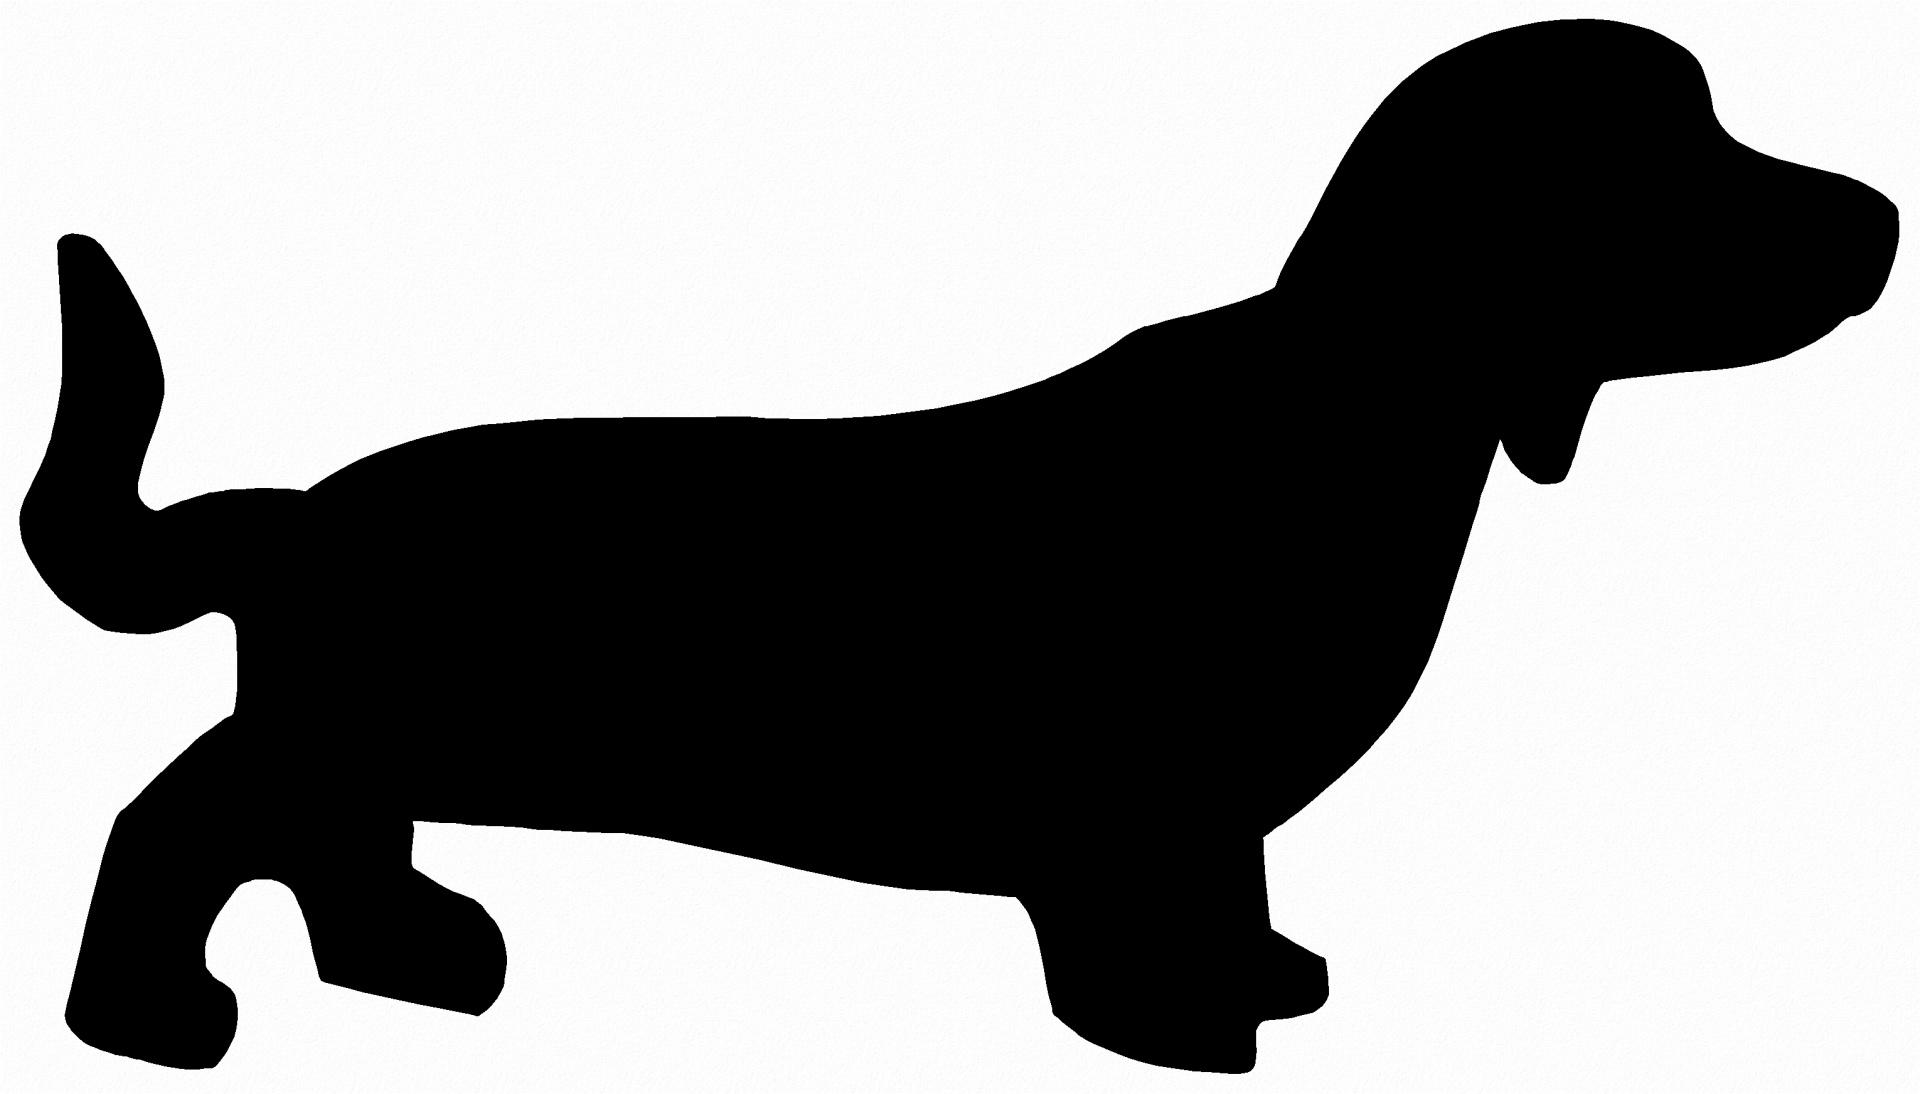 1920x1094 Silhouette Of An Animal Free Stock Photo